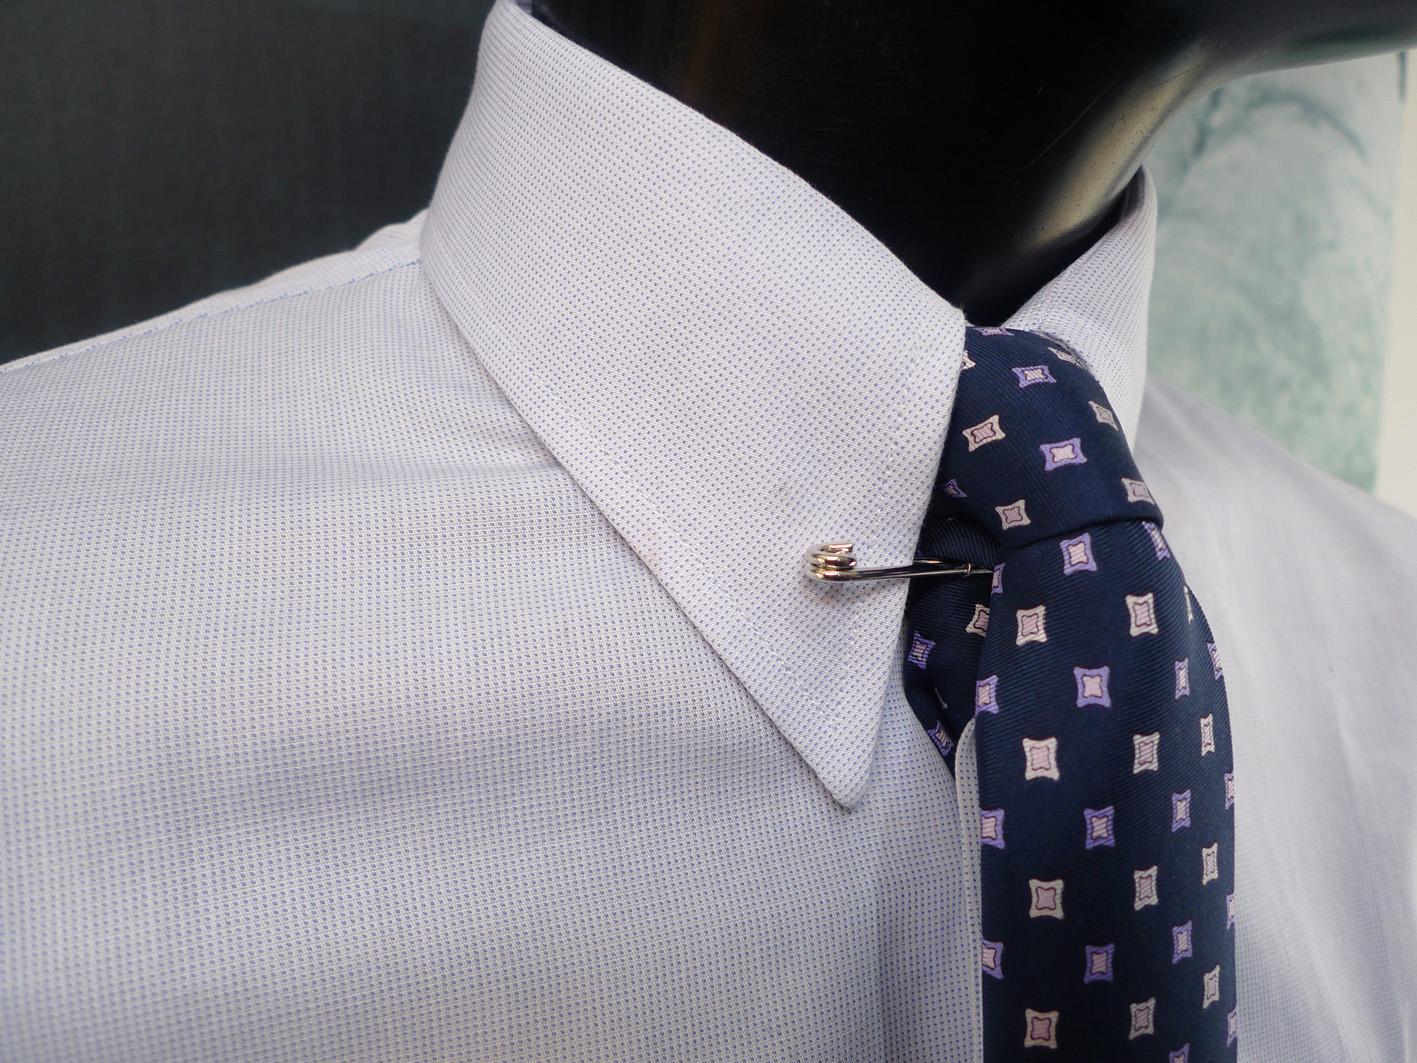 Shirts Tie Pin Collar Bcd Tofu House